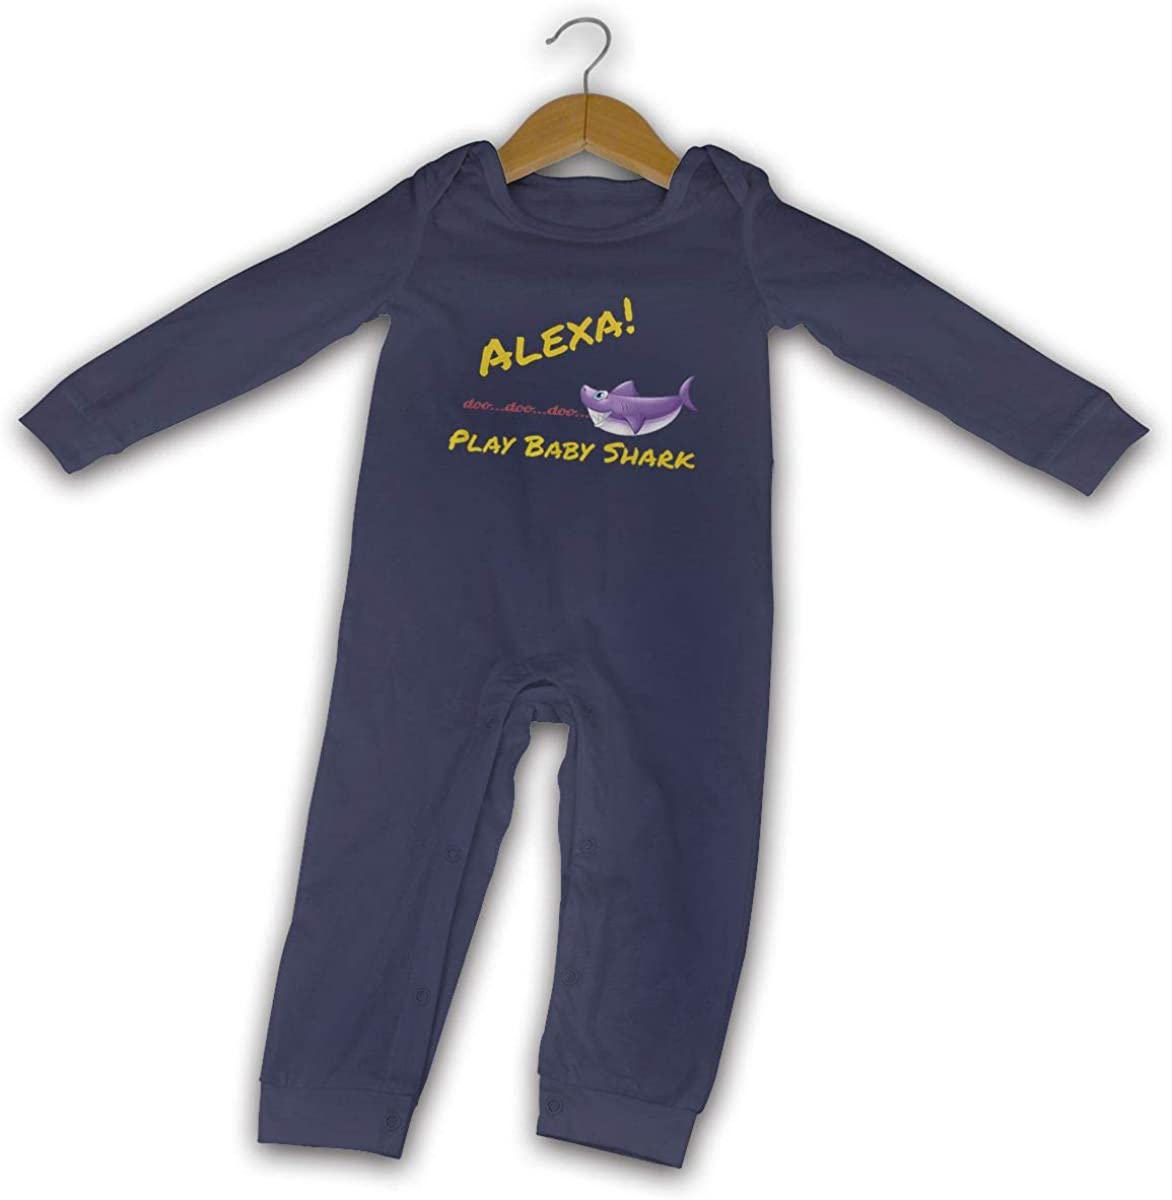 FengZe Baby Boy Girl O-Neck Long-Sleeve Jersey Bodysuit Alexa Play Baby Shark Kids T Shirts Funny Crawling Clothes Black